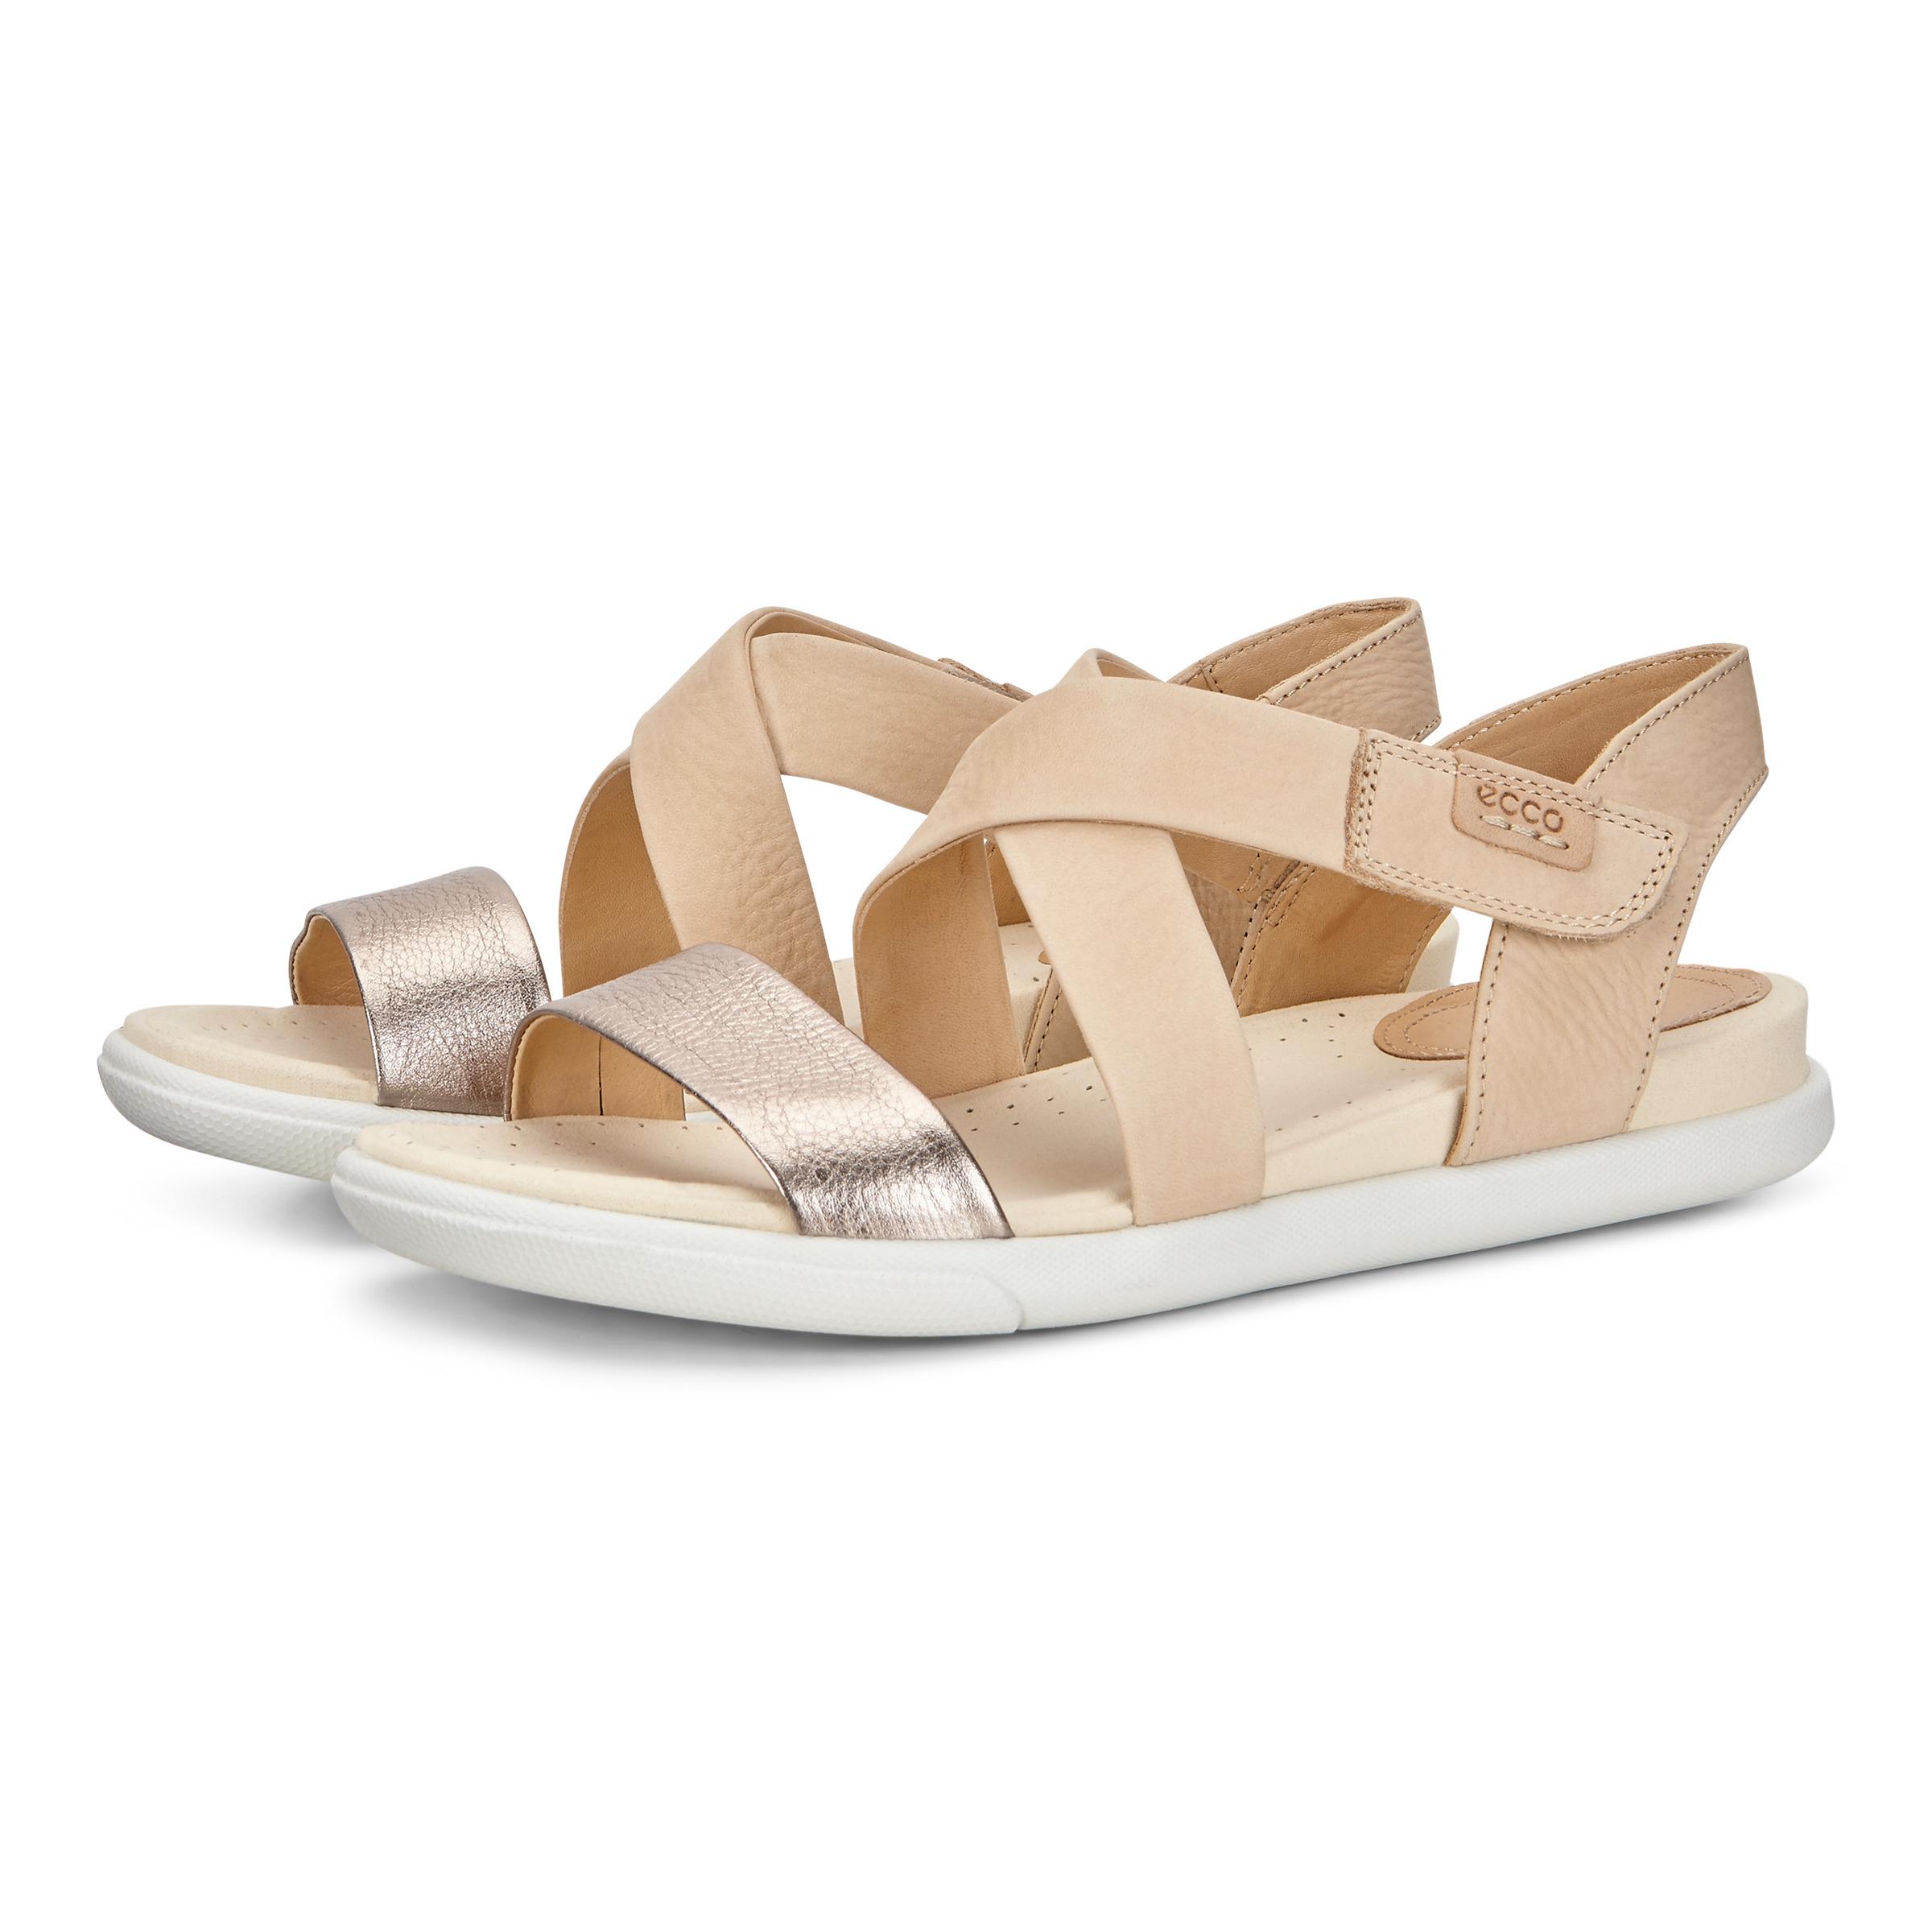 Shop Womens DAMARA SANDAL ECCO Shoes NZ